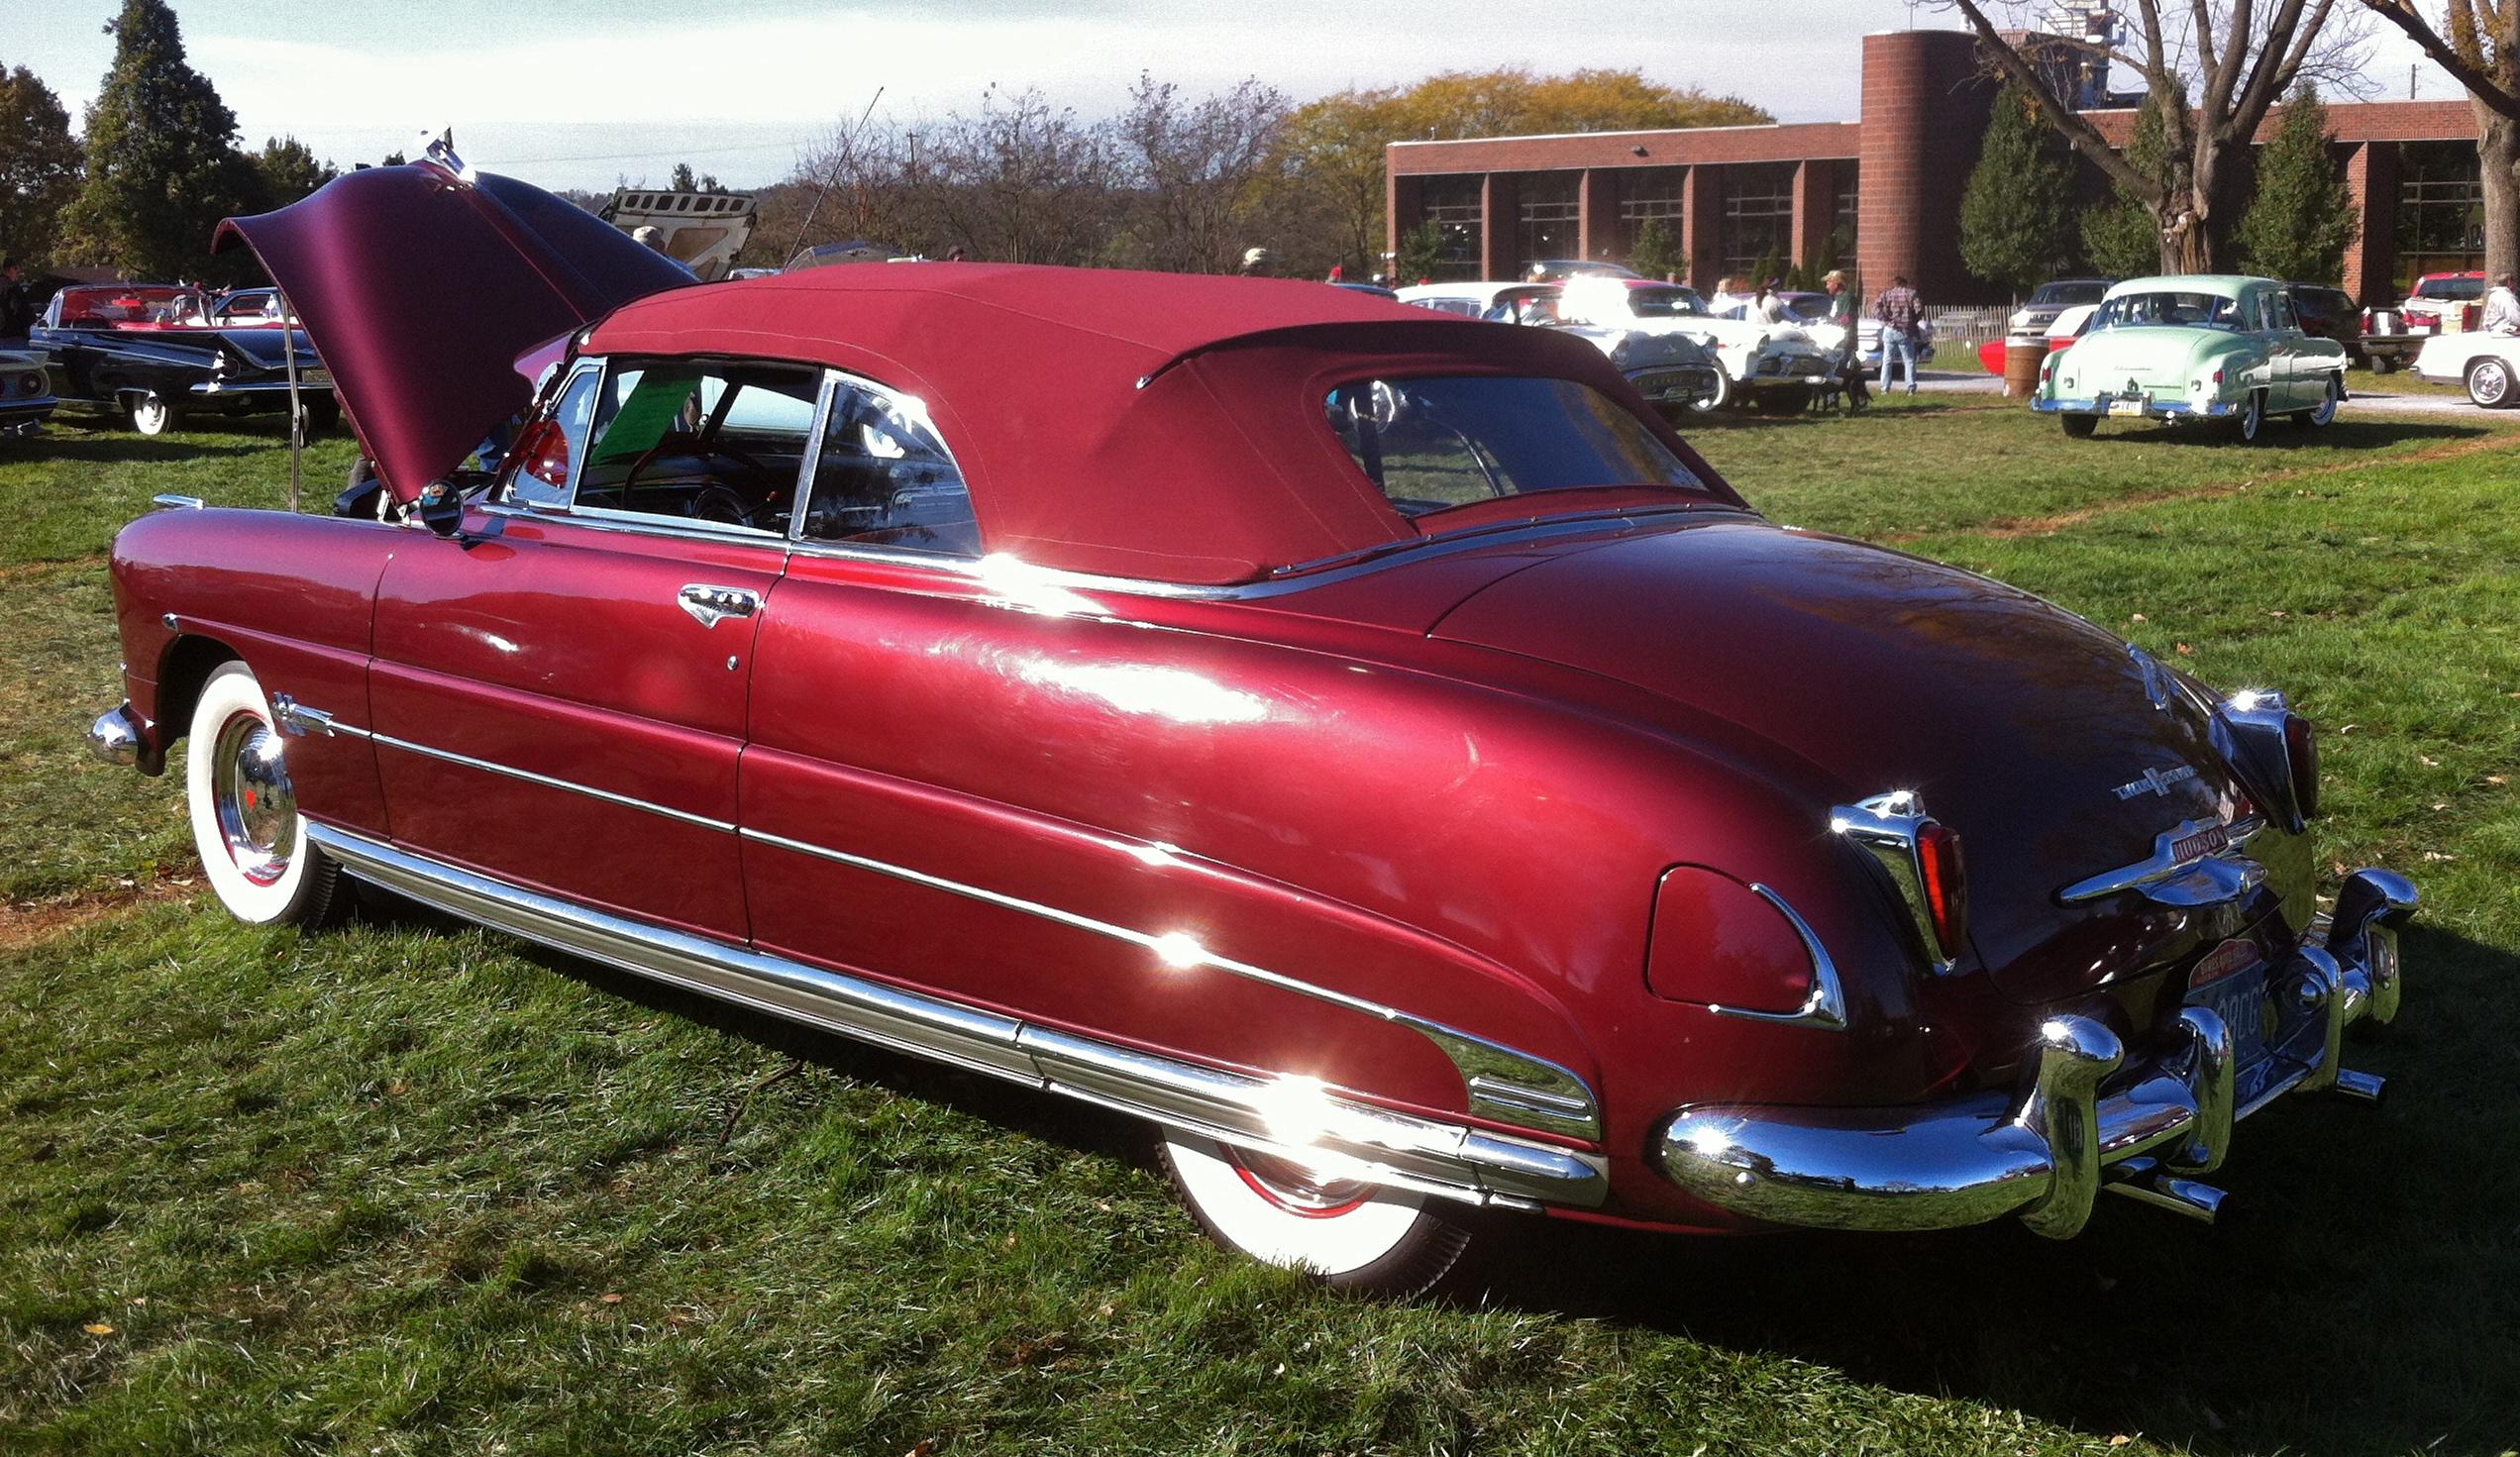 Hershey Car Show >> File:1951 Hudson maroon convertible Hershey 2012 a.jpg - Wikimedia Commons